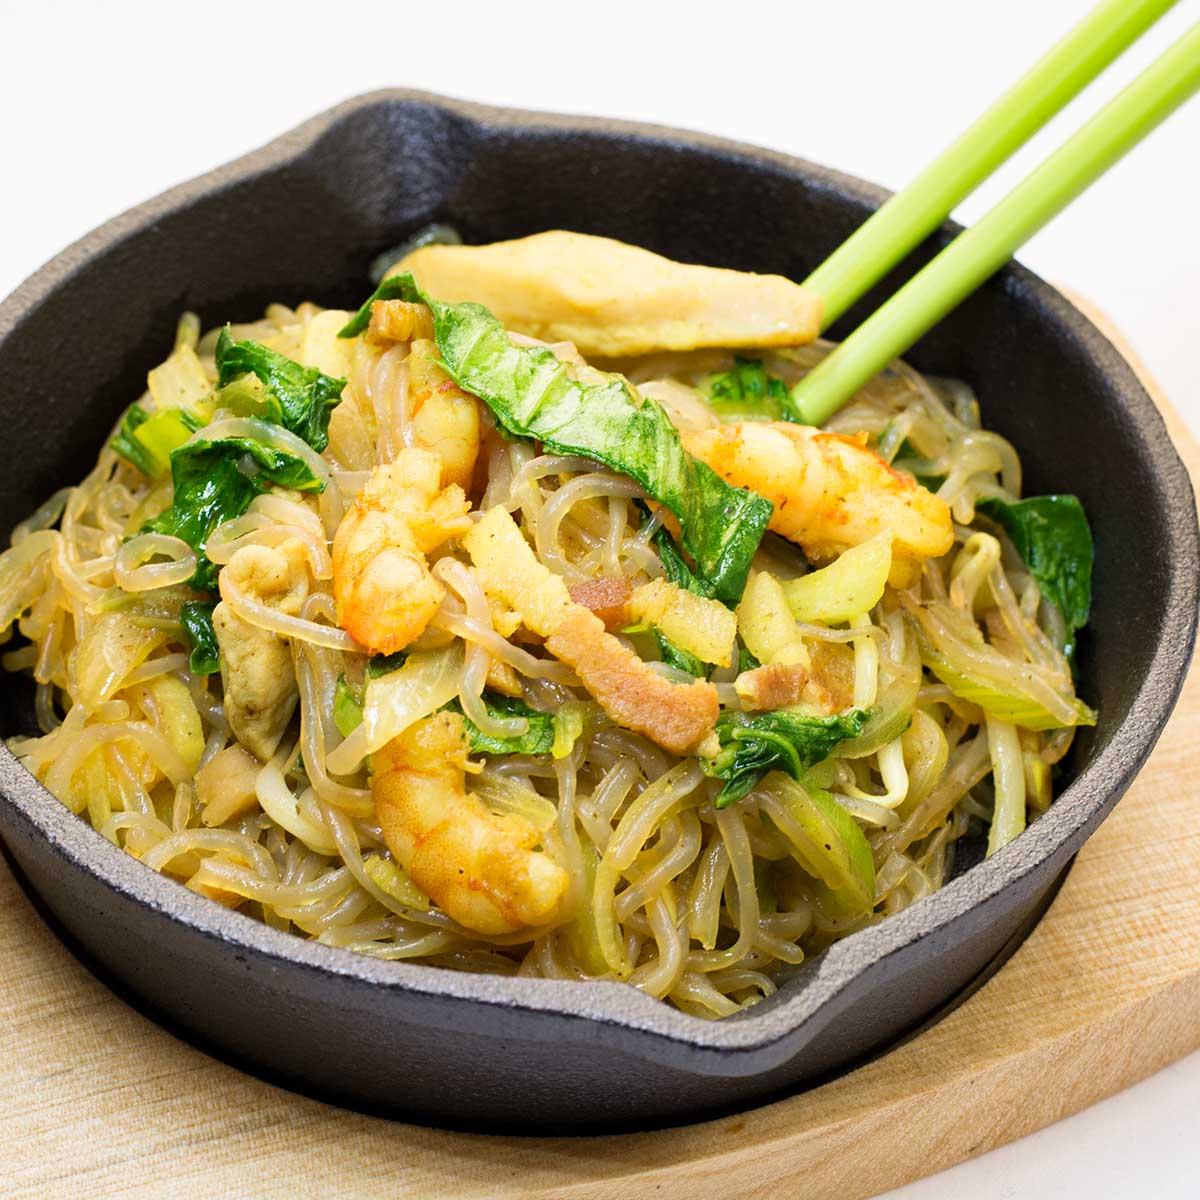 Keto Singapore Noodles in a mini frying pan